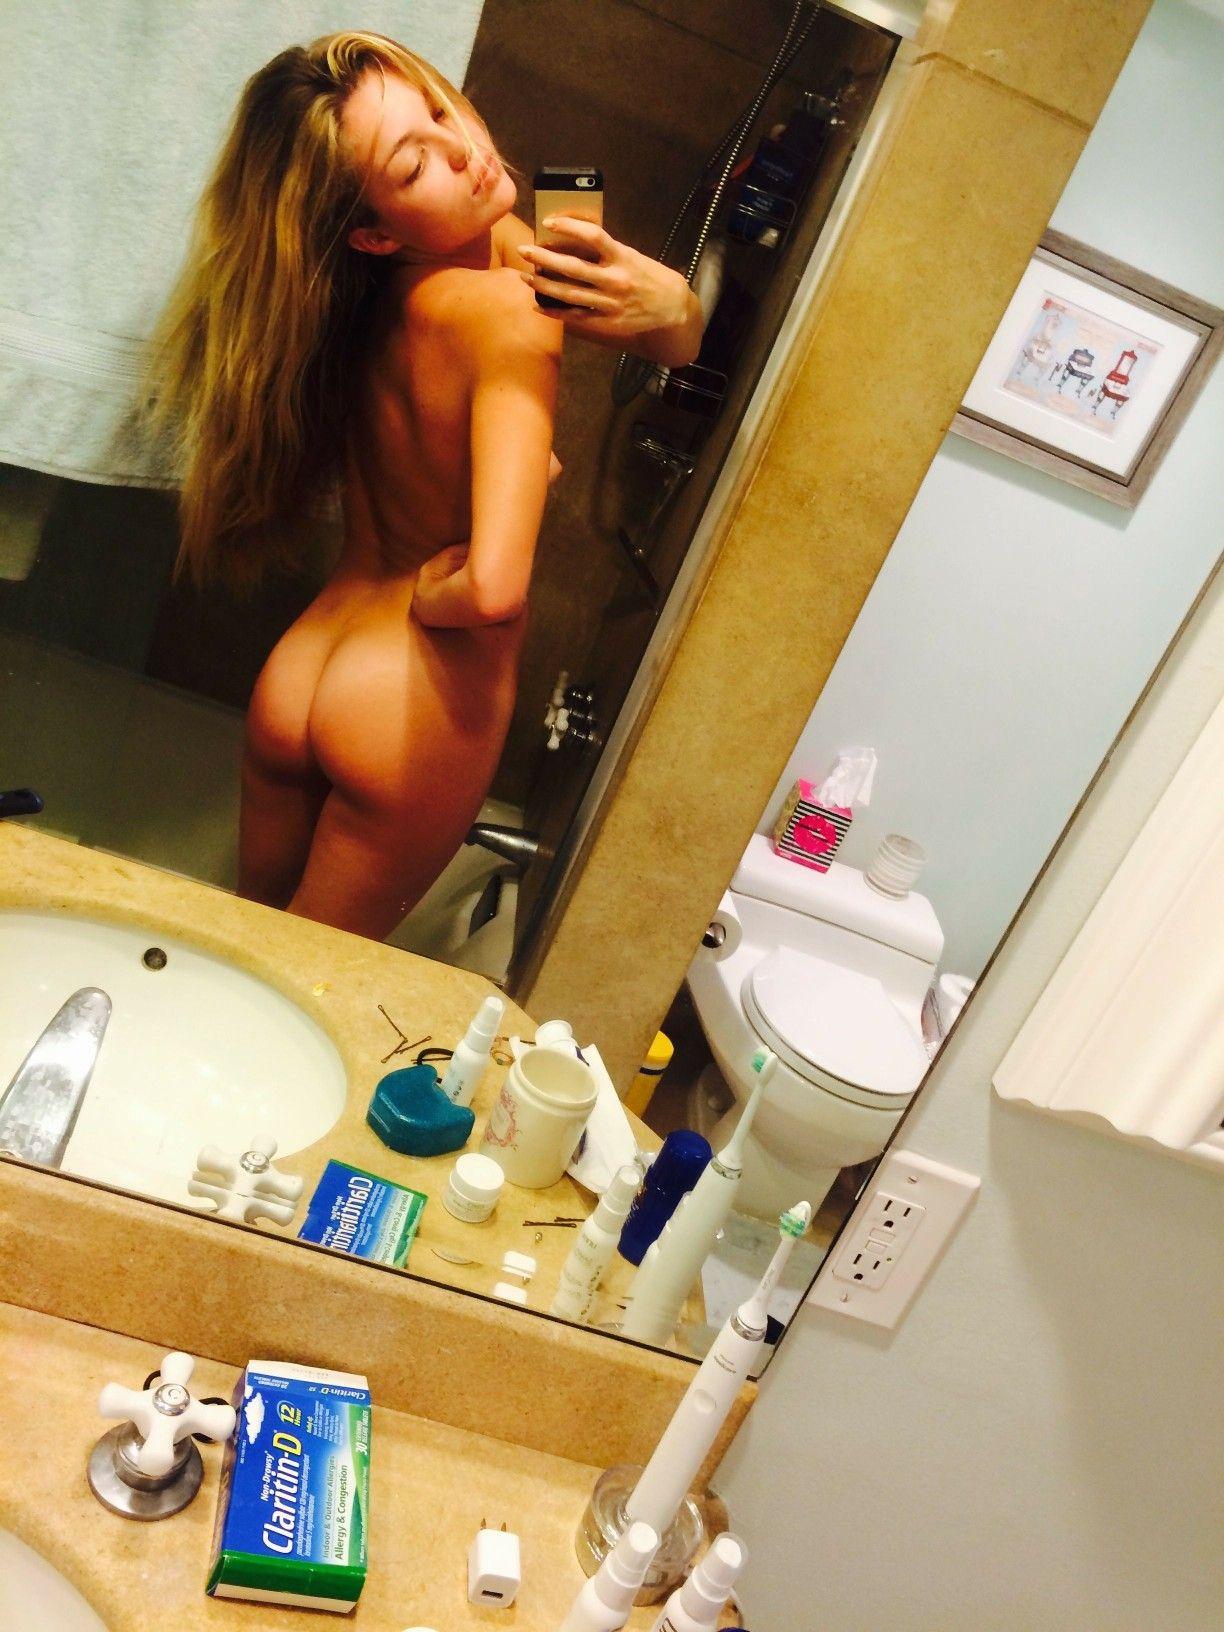 Cleavage Selfie Lili Simmons naked photo 2017